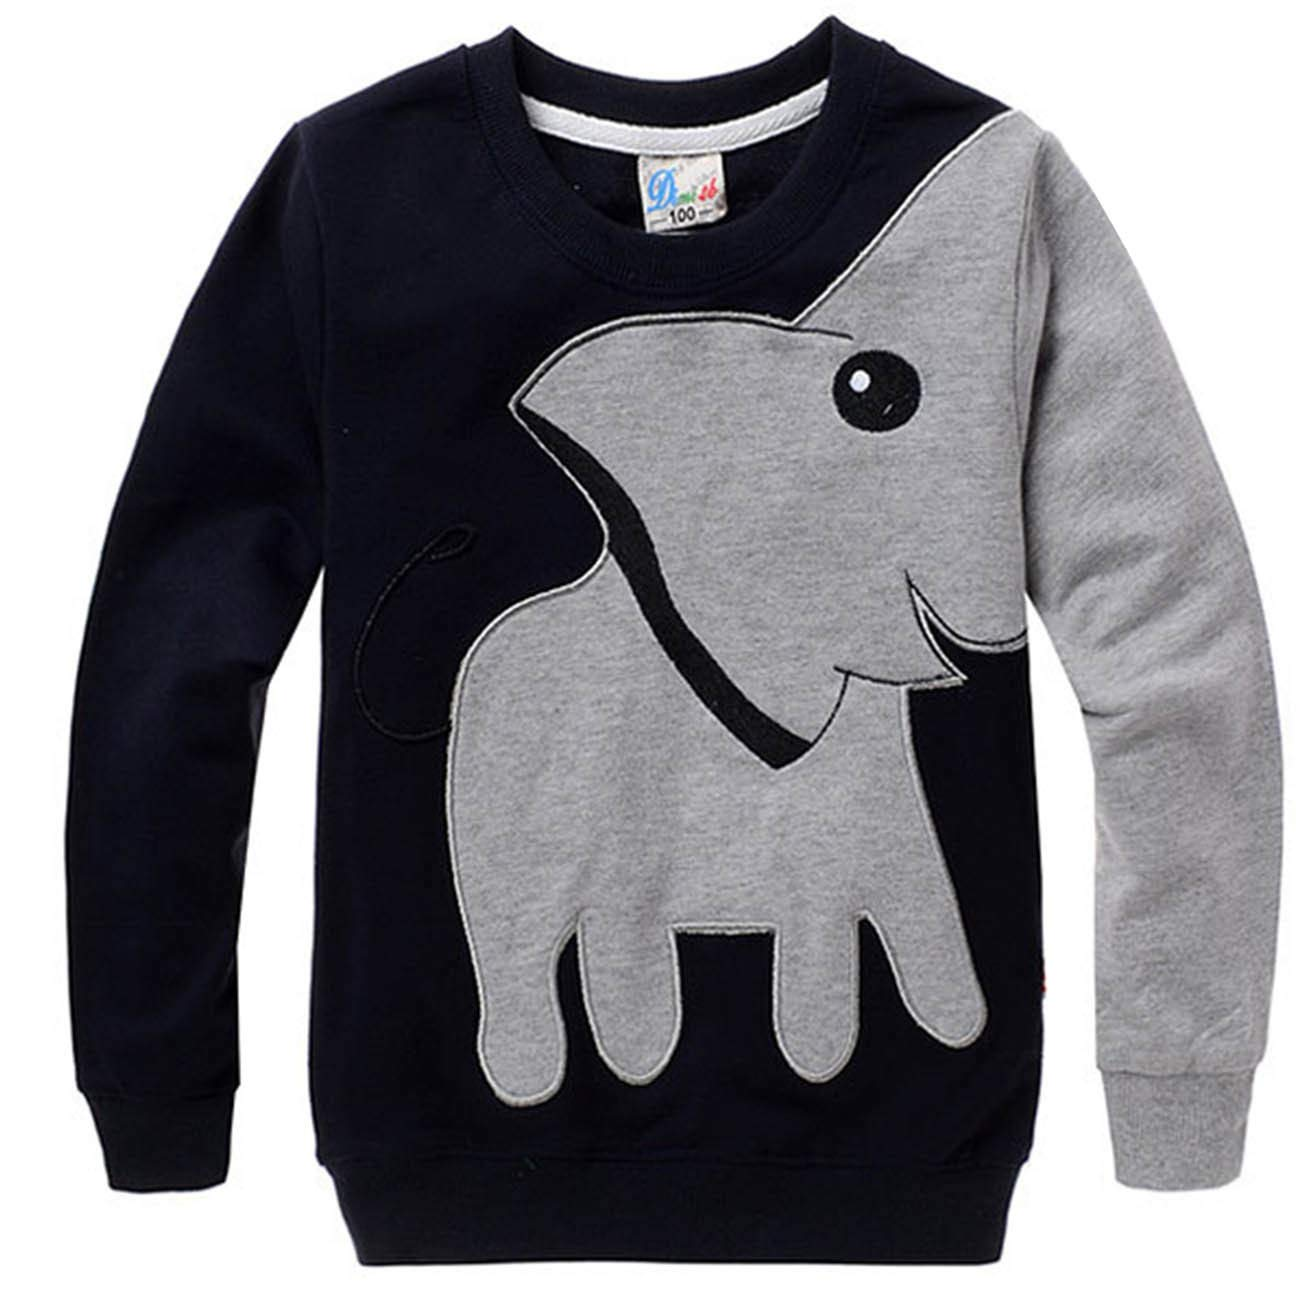 Kinder Jungen Baumwolle Sweatshirt Herbst//Winter Langarmshirt Elefant Pullover Top Kleidung Gr/ün,85-95cm